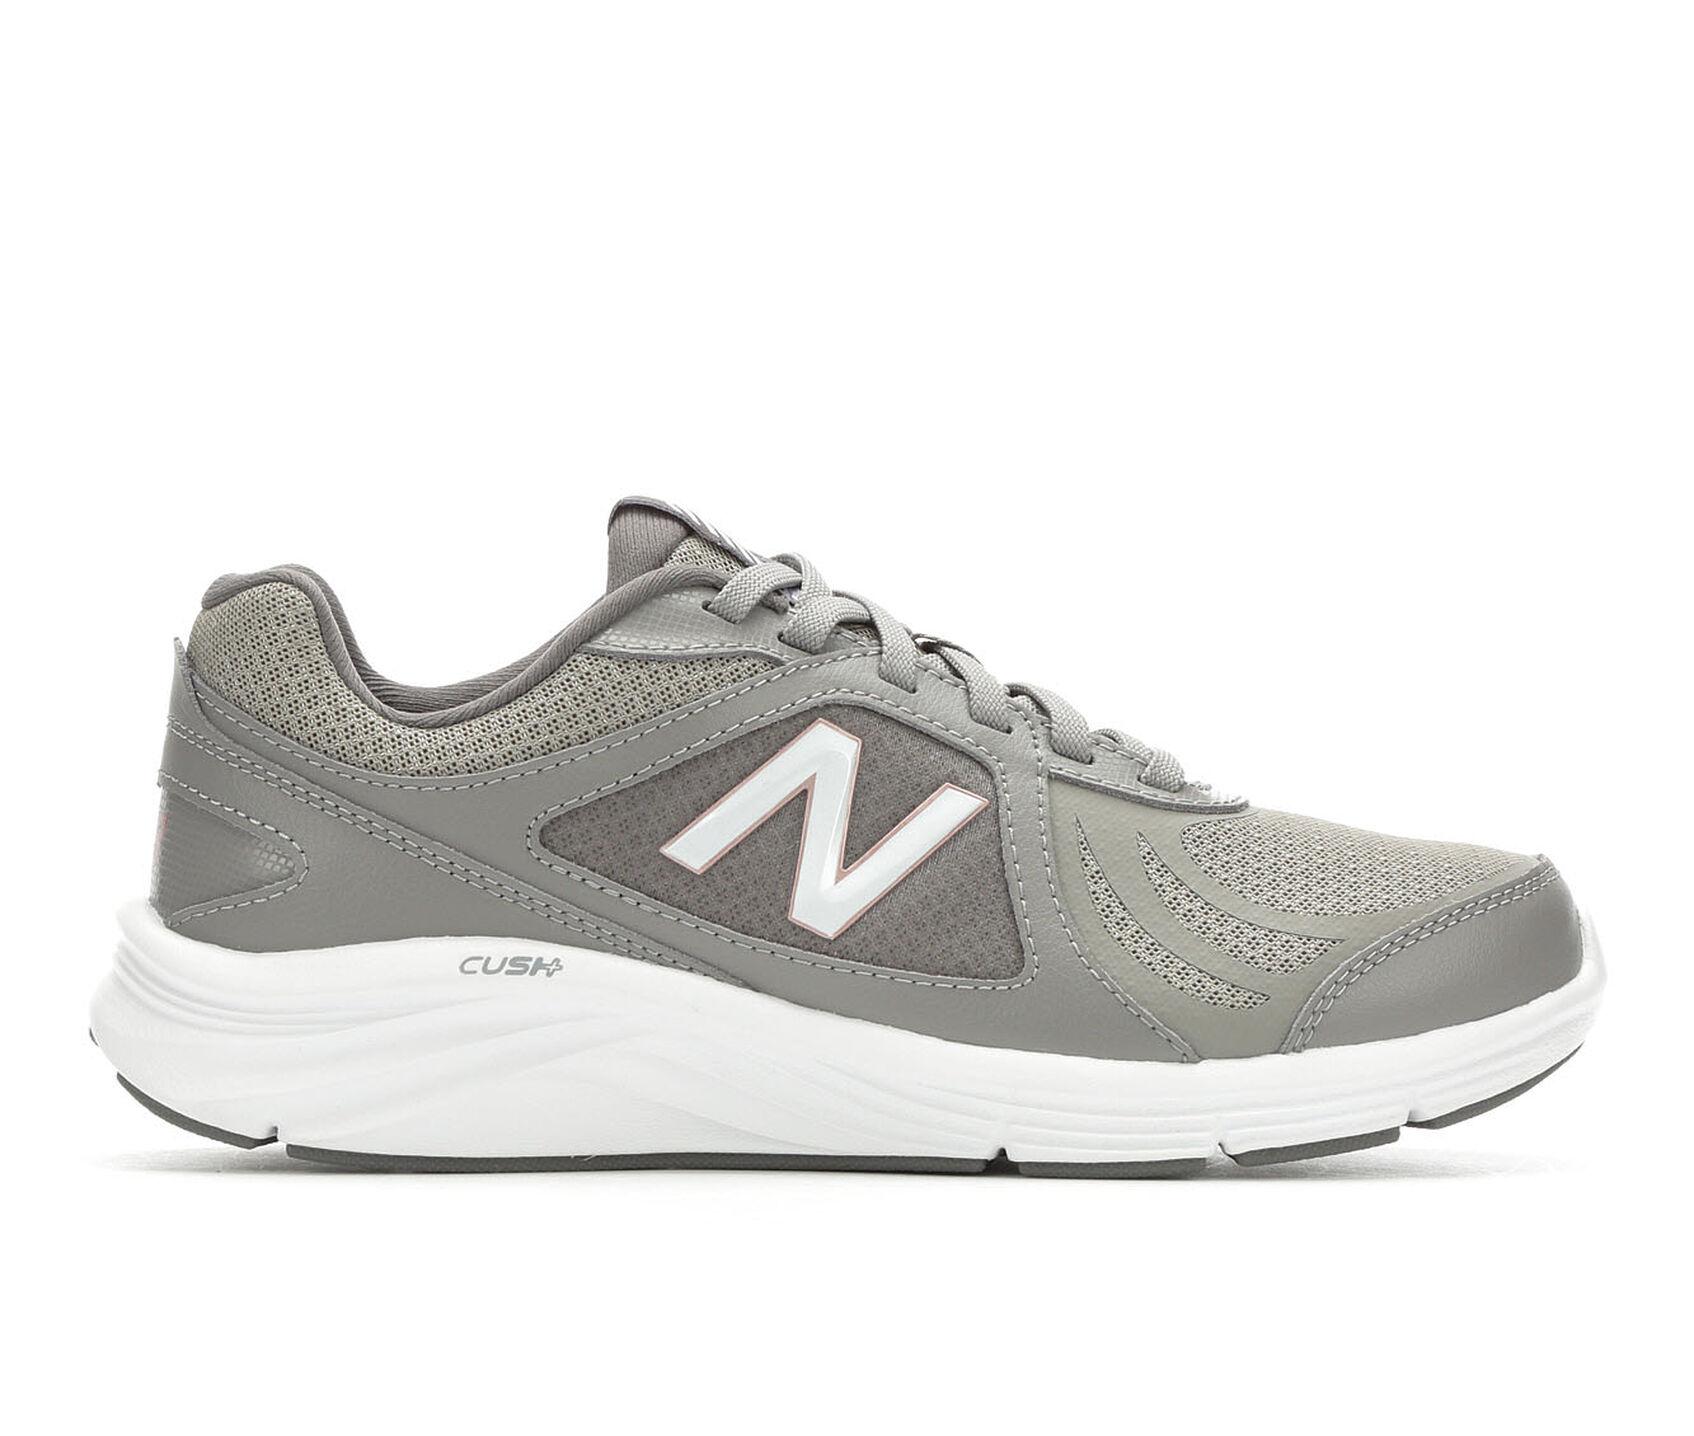 6b2104e4d420 Women s New Balance WW496 V3 Walking Shoes